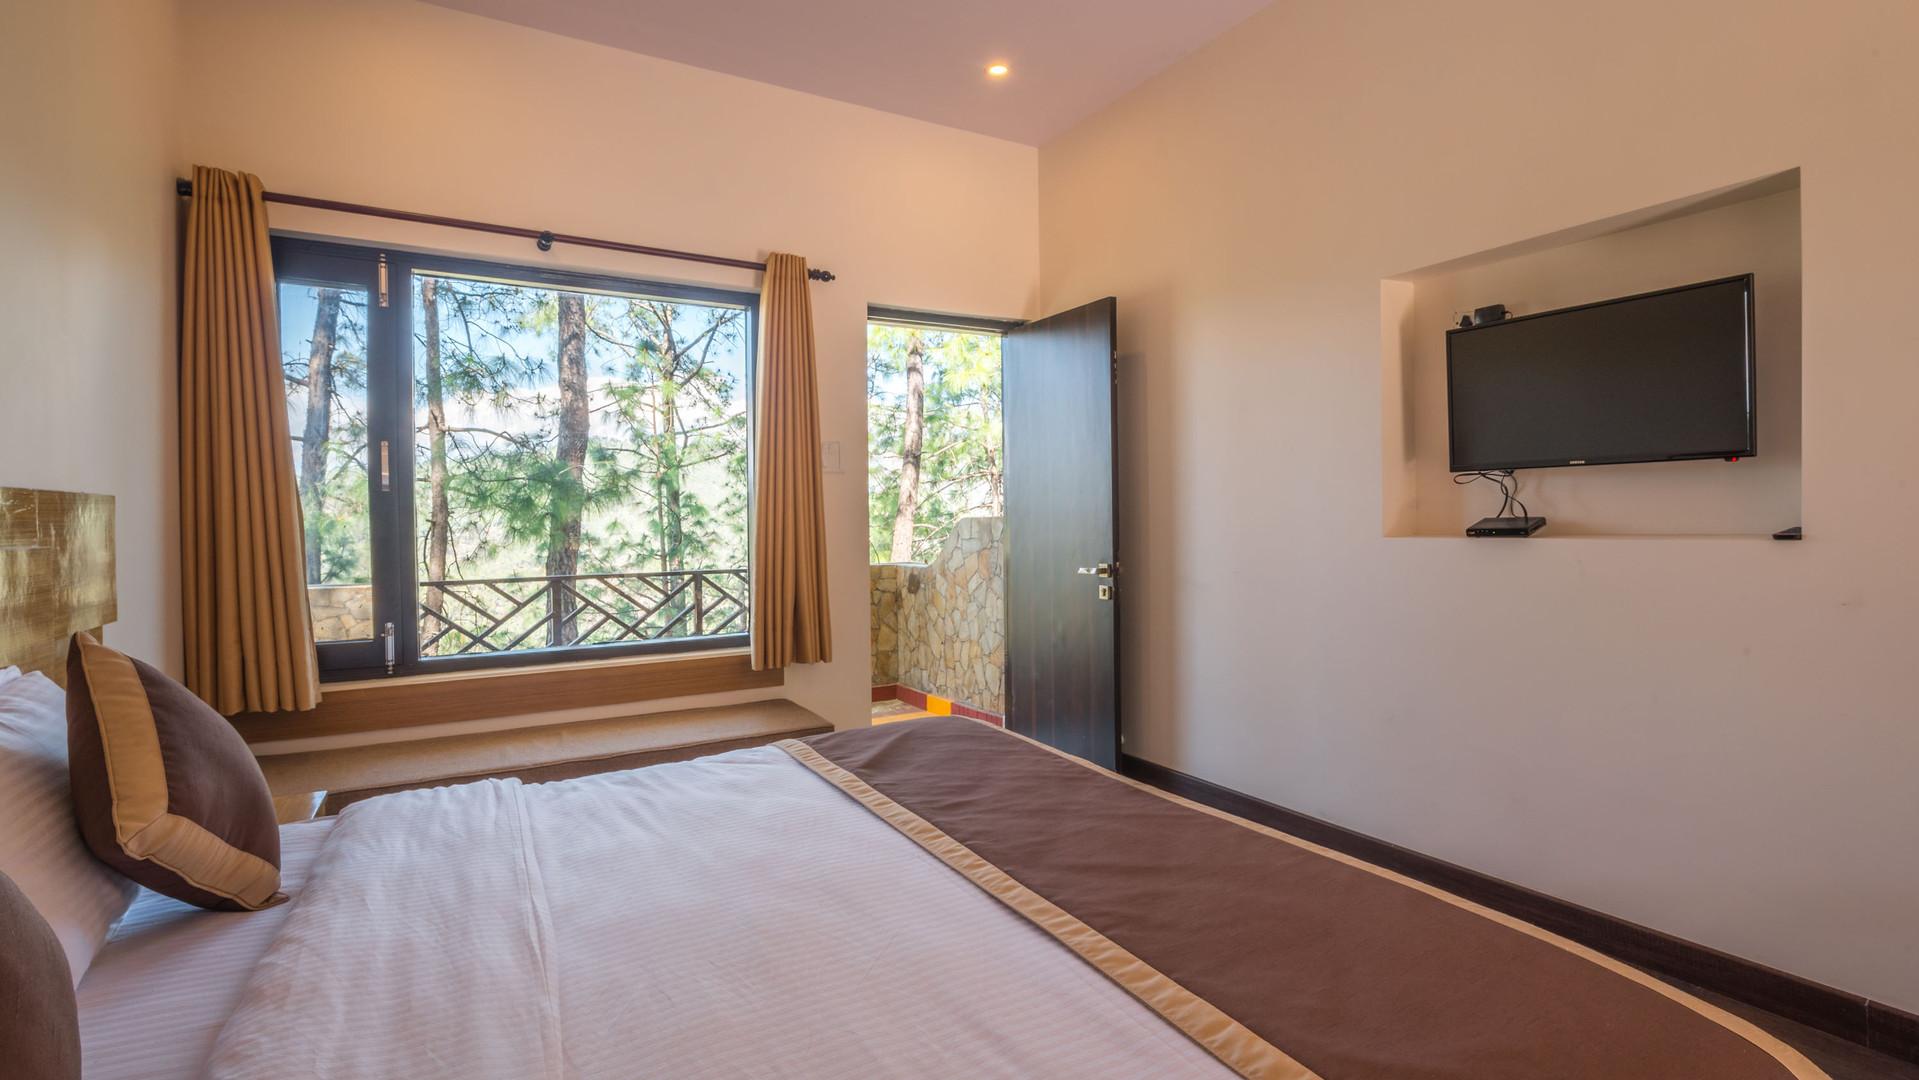 Executive-Rooms_Unbound_Boros_7.jpg